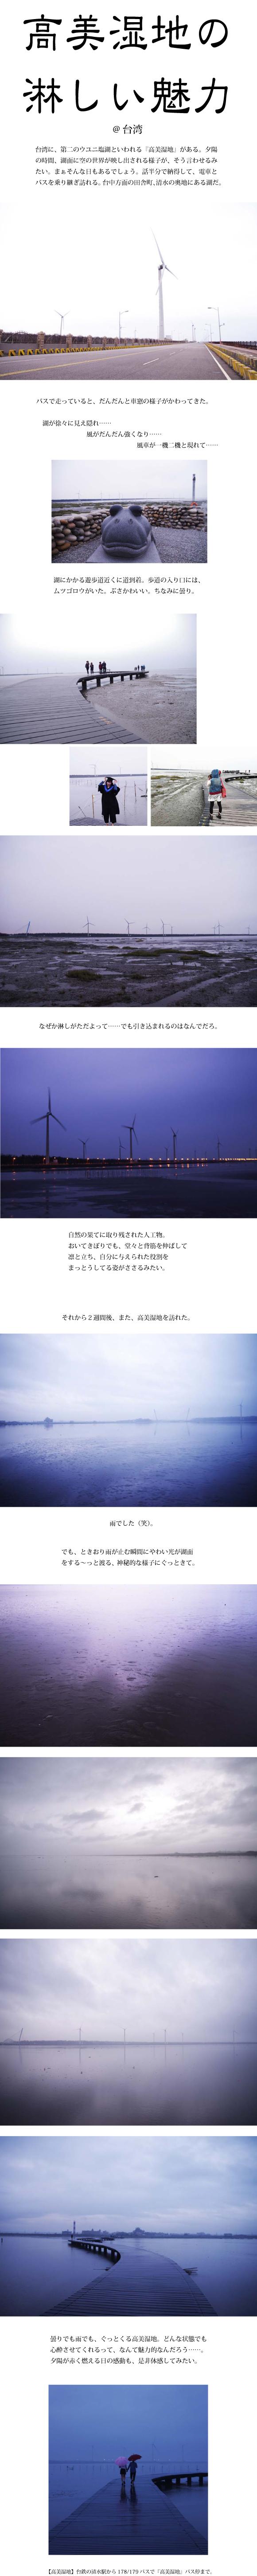 tomako160406.jpg